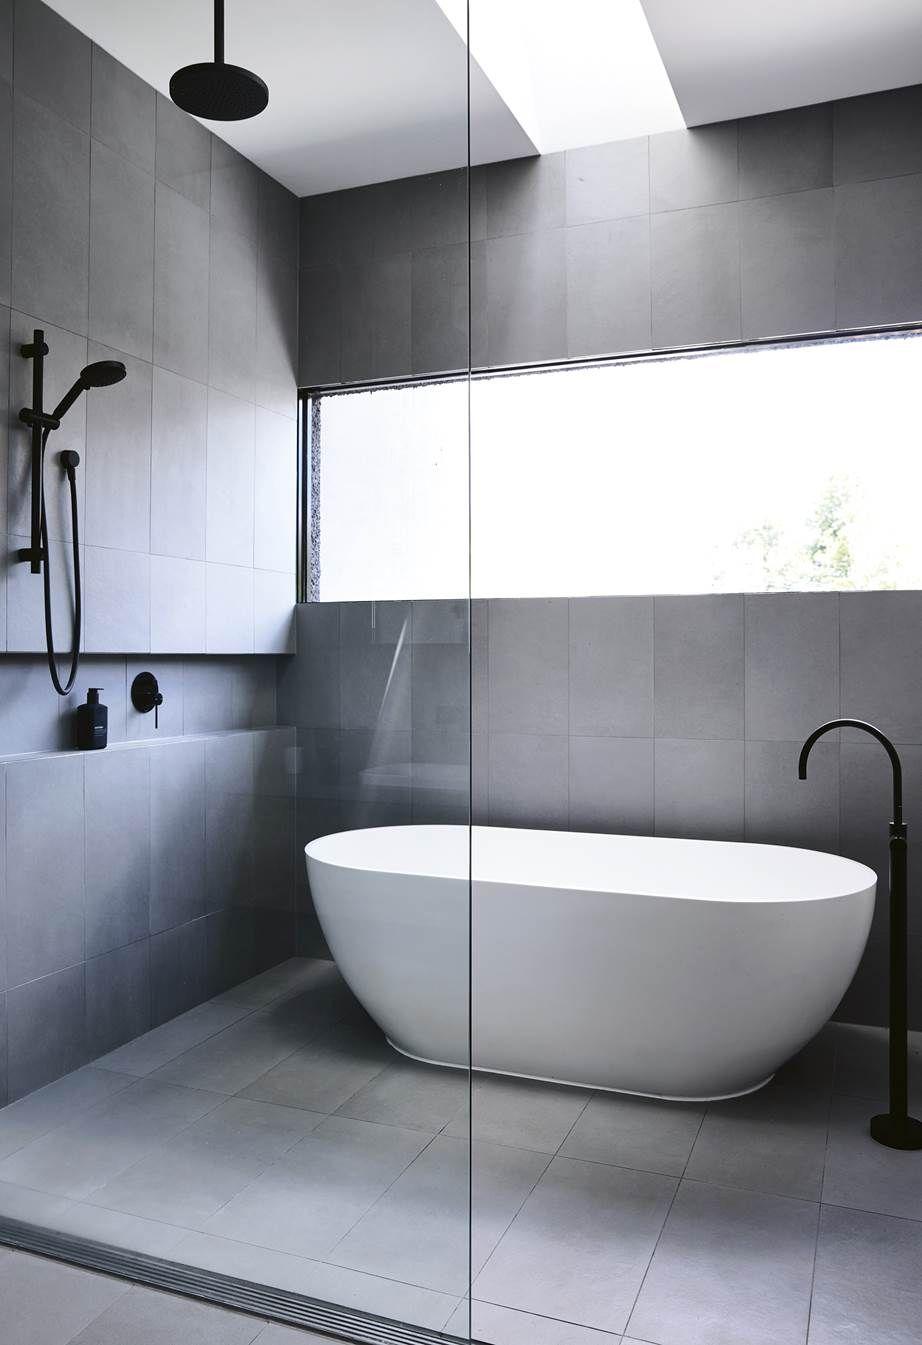 8 bathroom ideas that will transform your zen spac